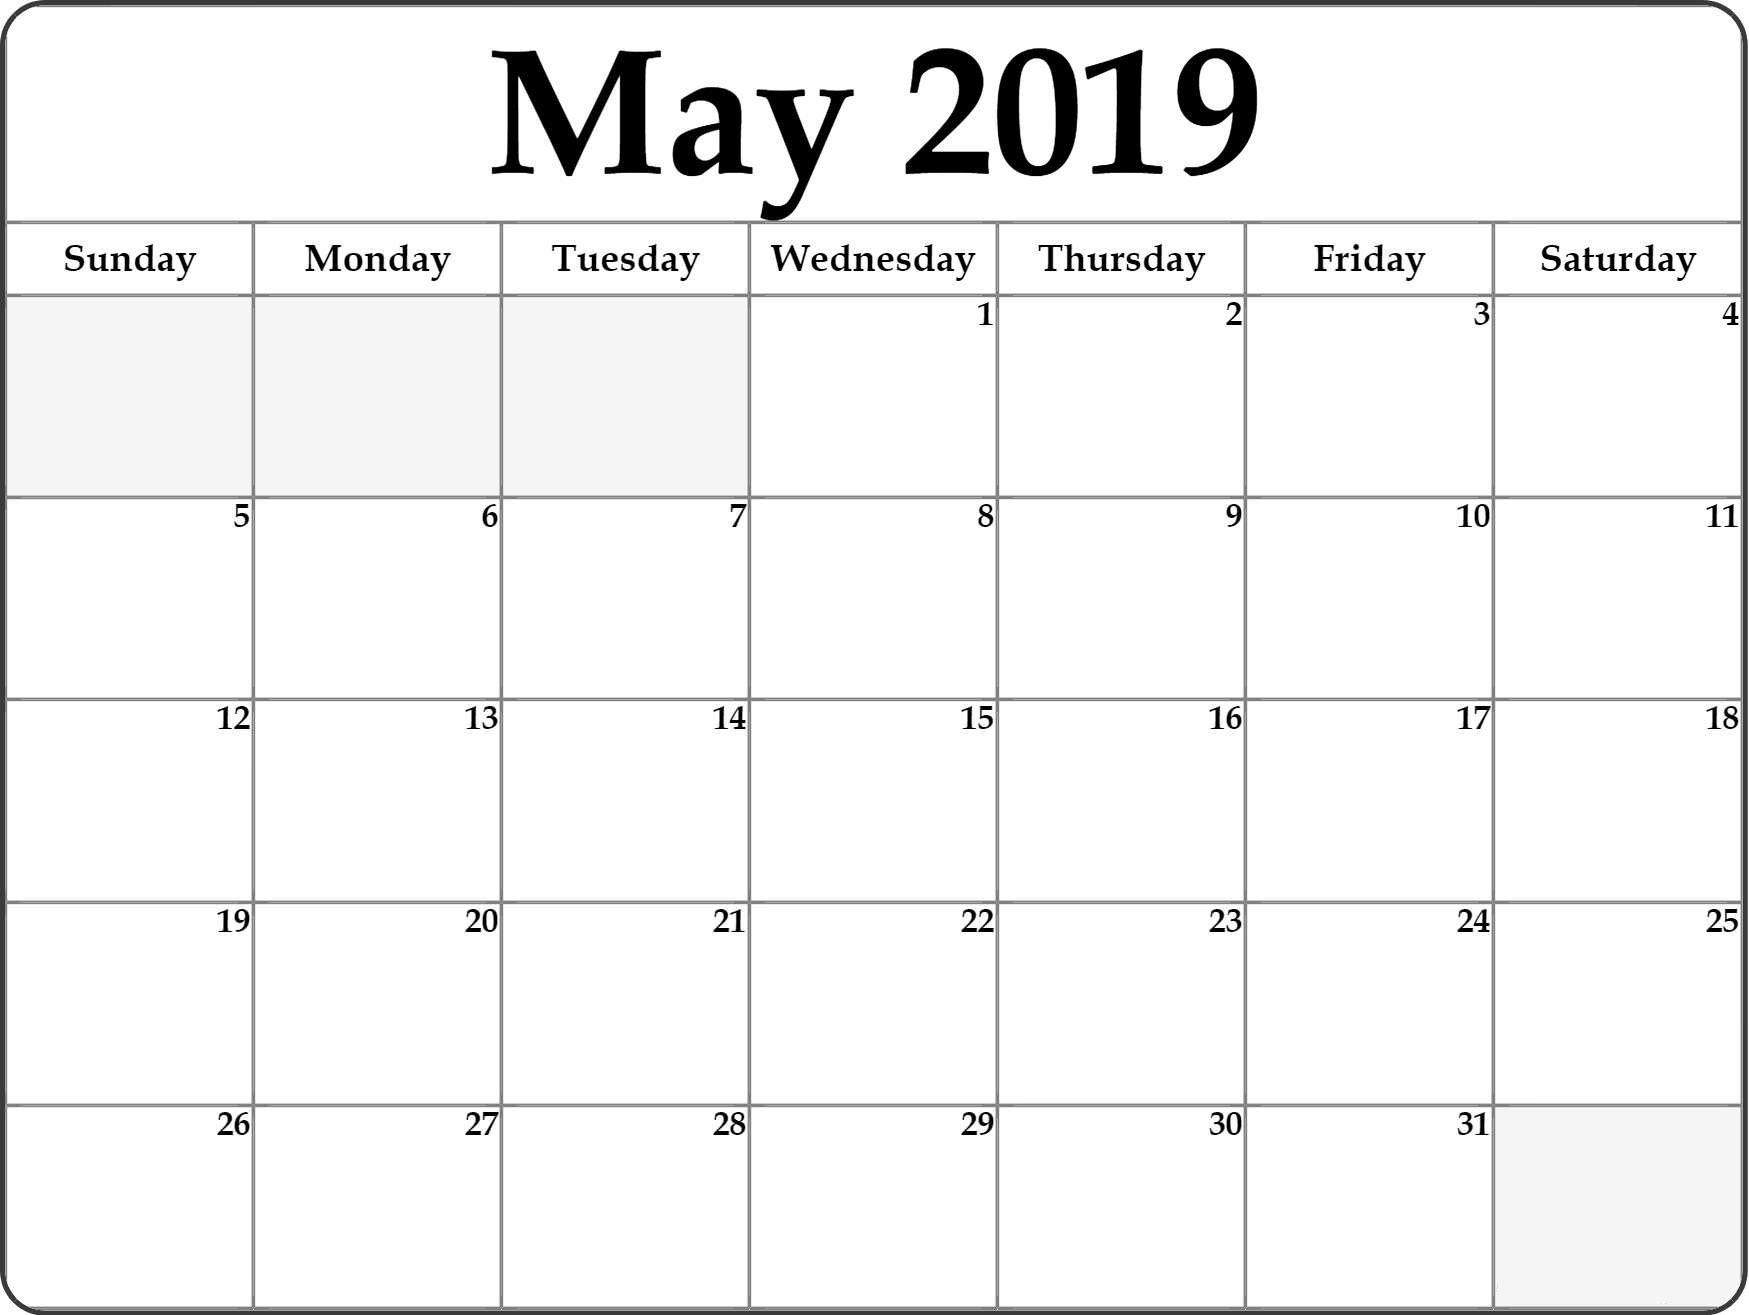 May 2019 Blank Calendar #stylish #design | Editable Calendar with regard to Wincalendar April 2020